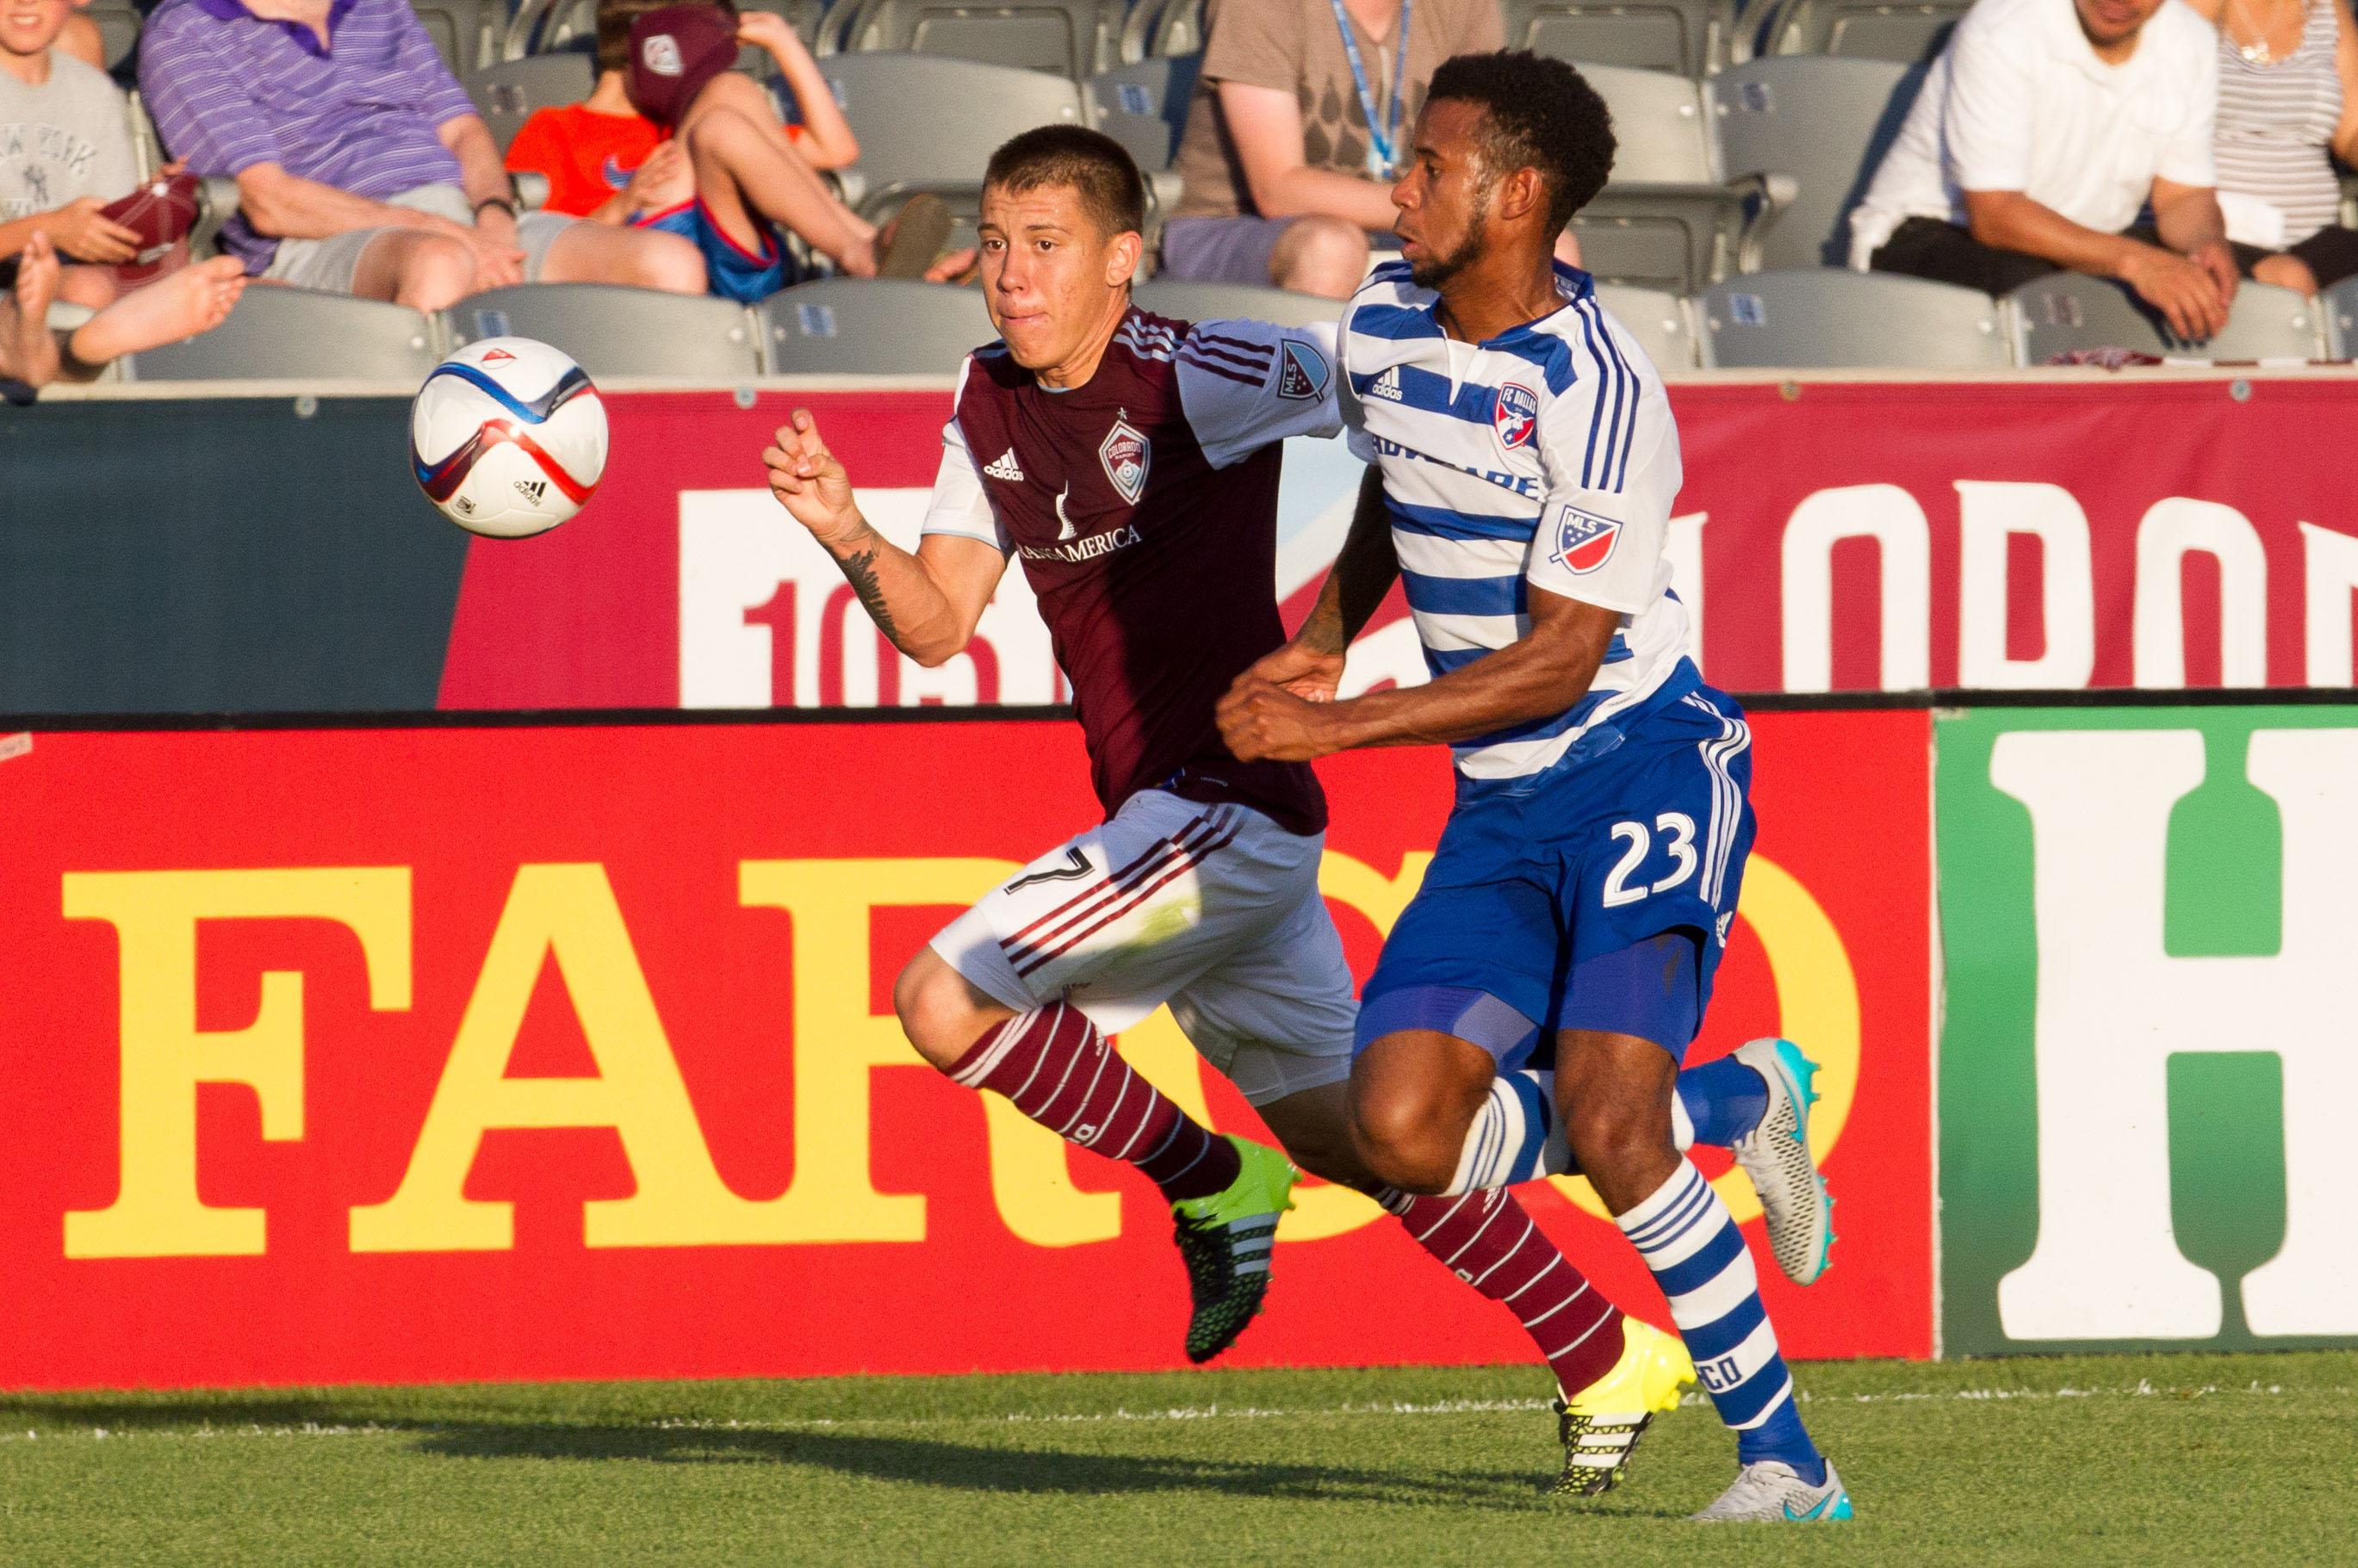 Colorado Rapids Dillon Serna outracing FC Dallas player Kellyn Acosta.